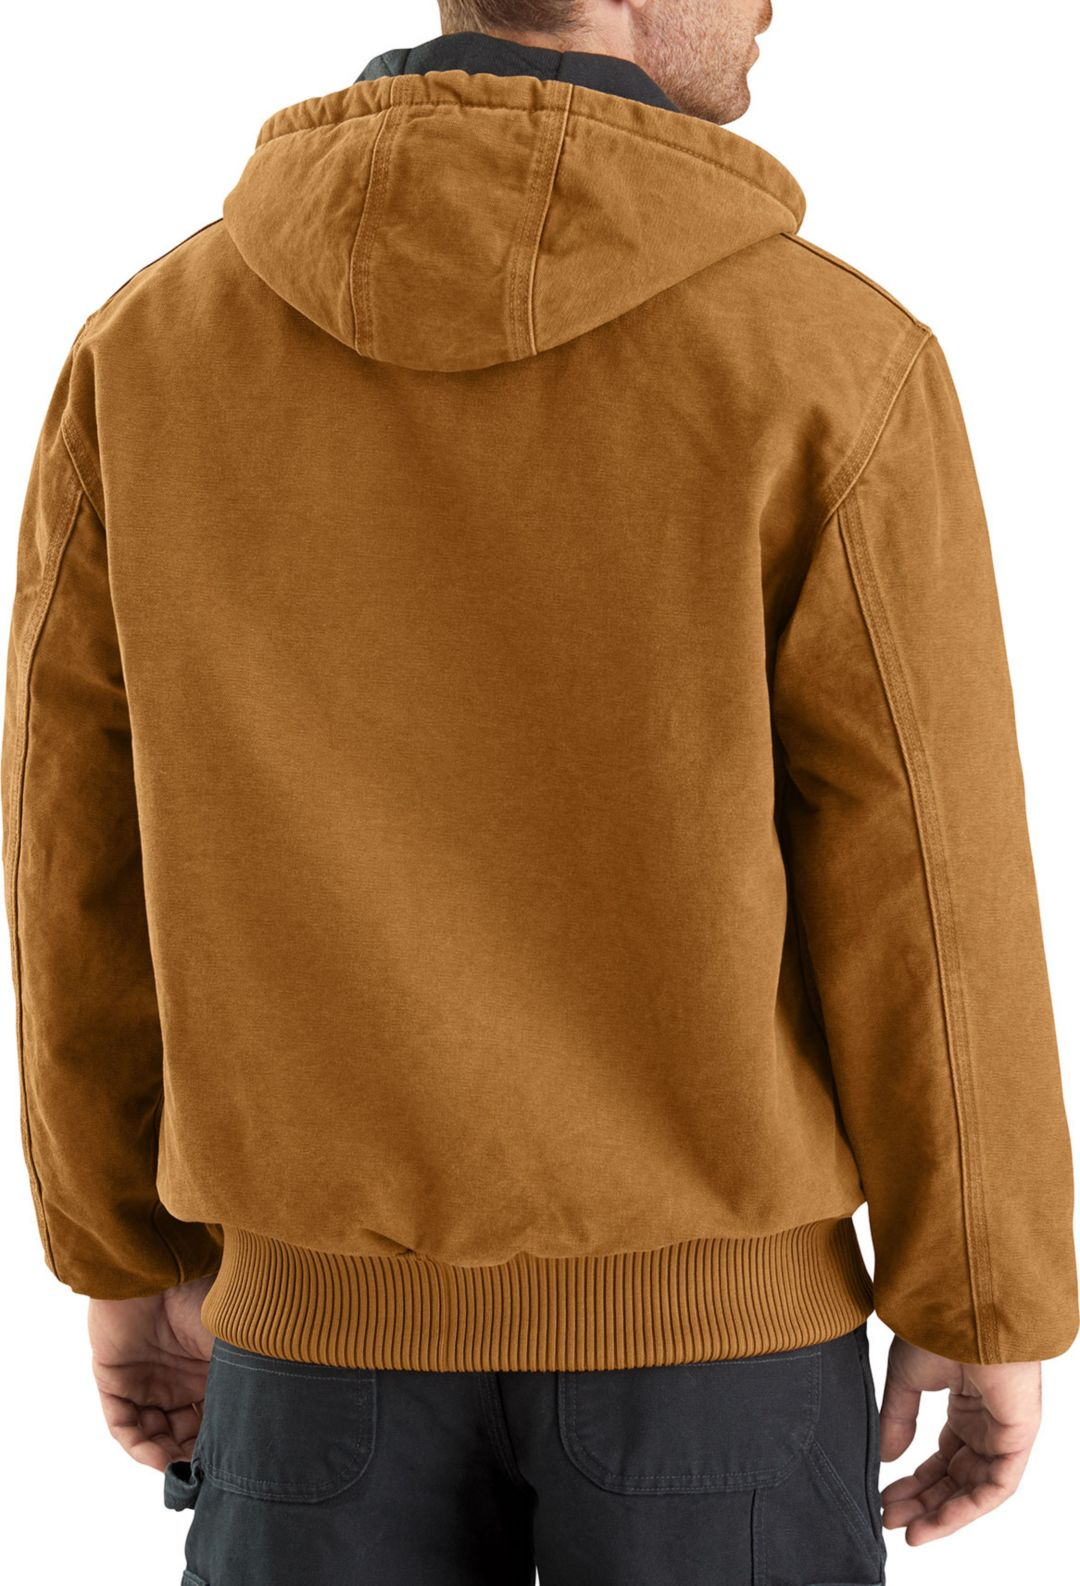 29992d6bd29 Carhartt Men's Sandstone Active Lined Jacket